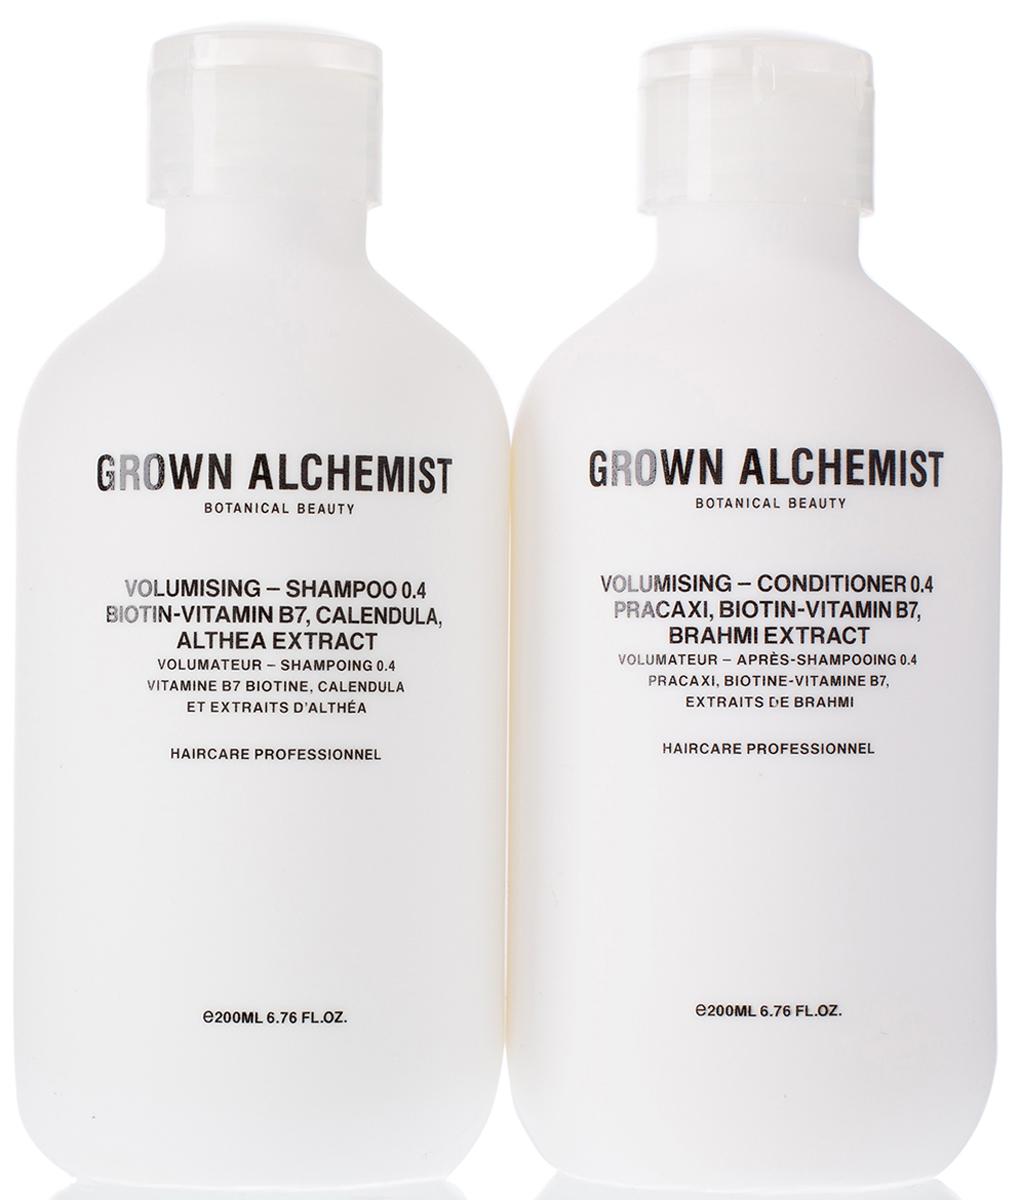 Grown Alchemist Набор для придания объема волосам (Шампунь для придания объема волосам 200 мл, Кондиционер для придания объема волосам 200 мл) shot спрей для придания объема 250 мл спрей для придания объема 250 мл 250 мл